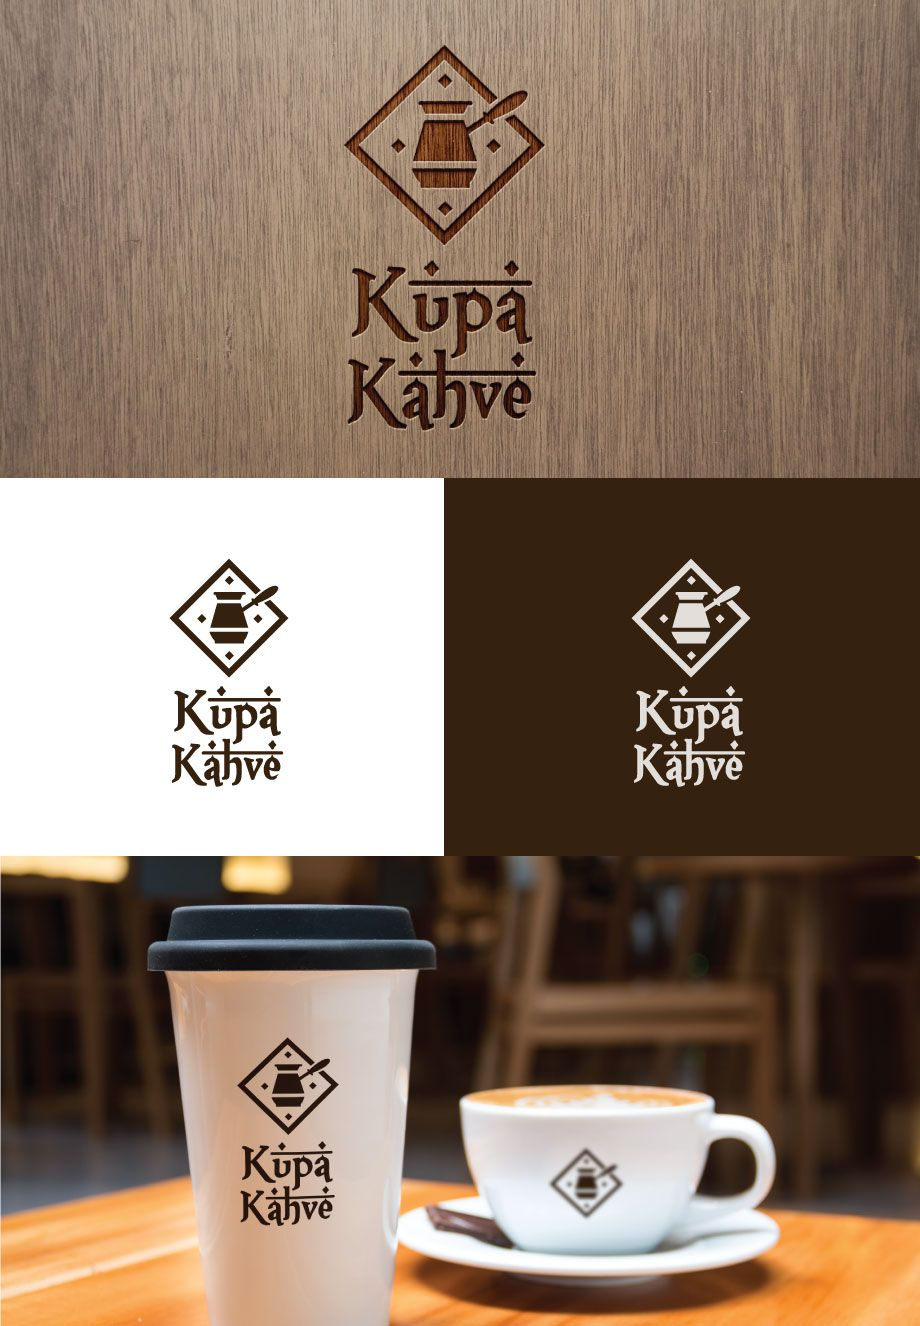 Logo For Turkish Coffee Shop Kupa Kahve Elegant Personable Logo Design By Kimdesigner Bri Coffee Bean Roasters Coffee Roasters Unique Business Cards Design